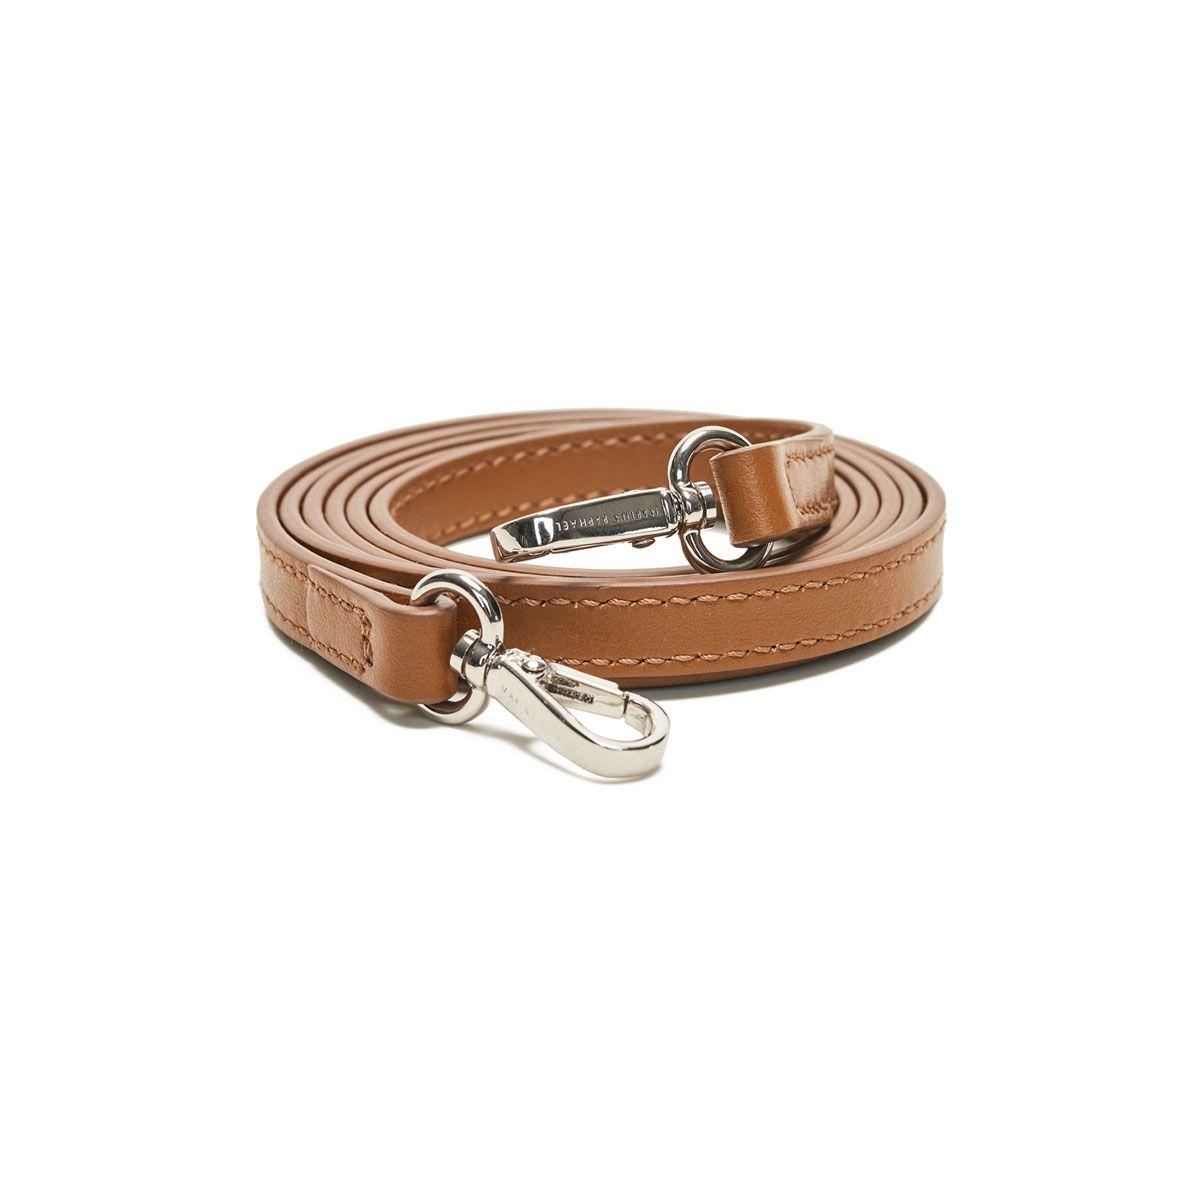 SS20 small caramel strap